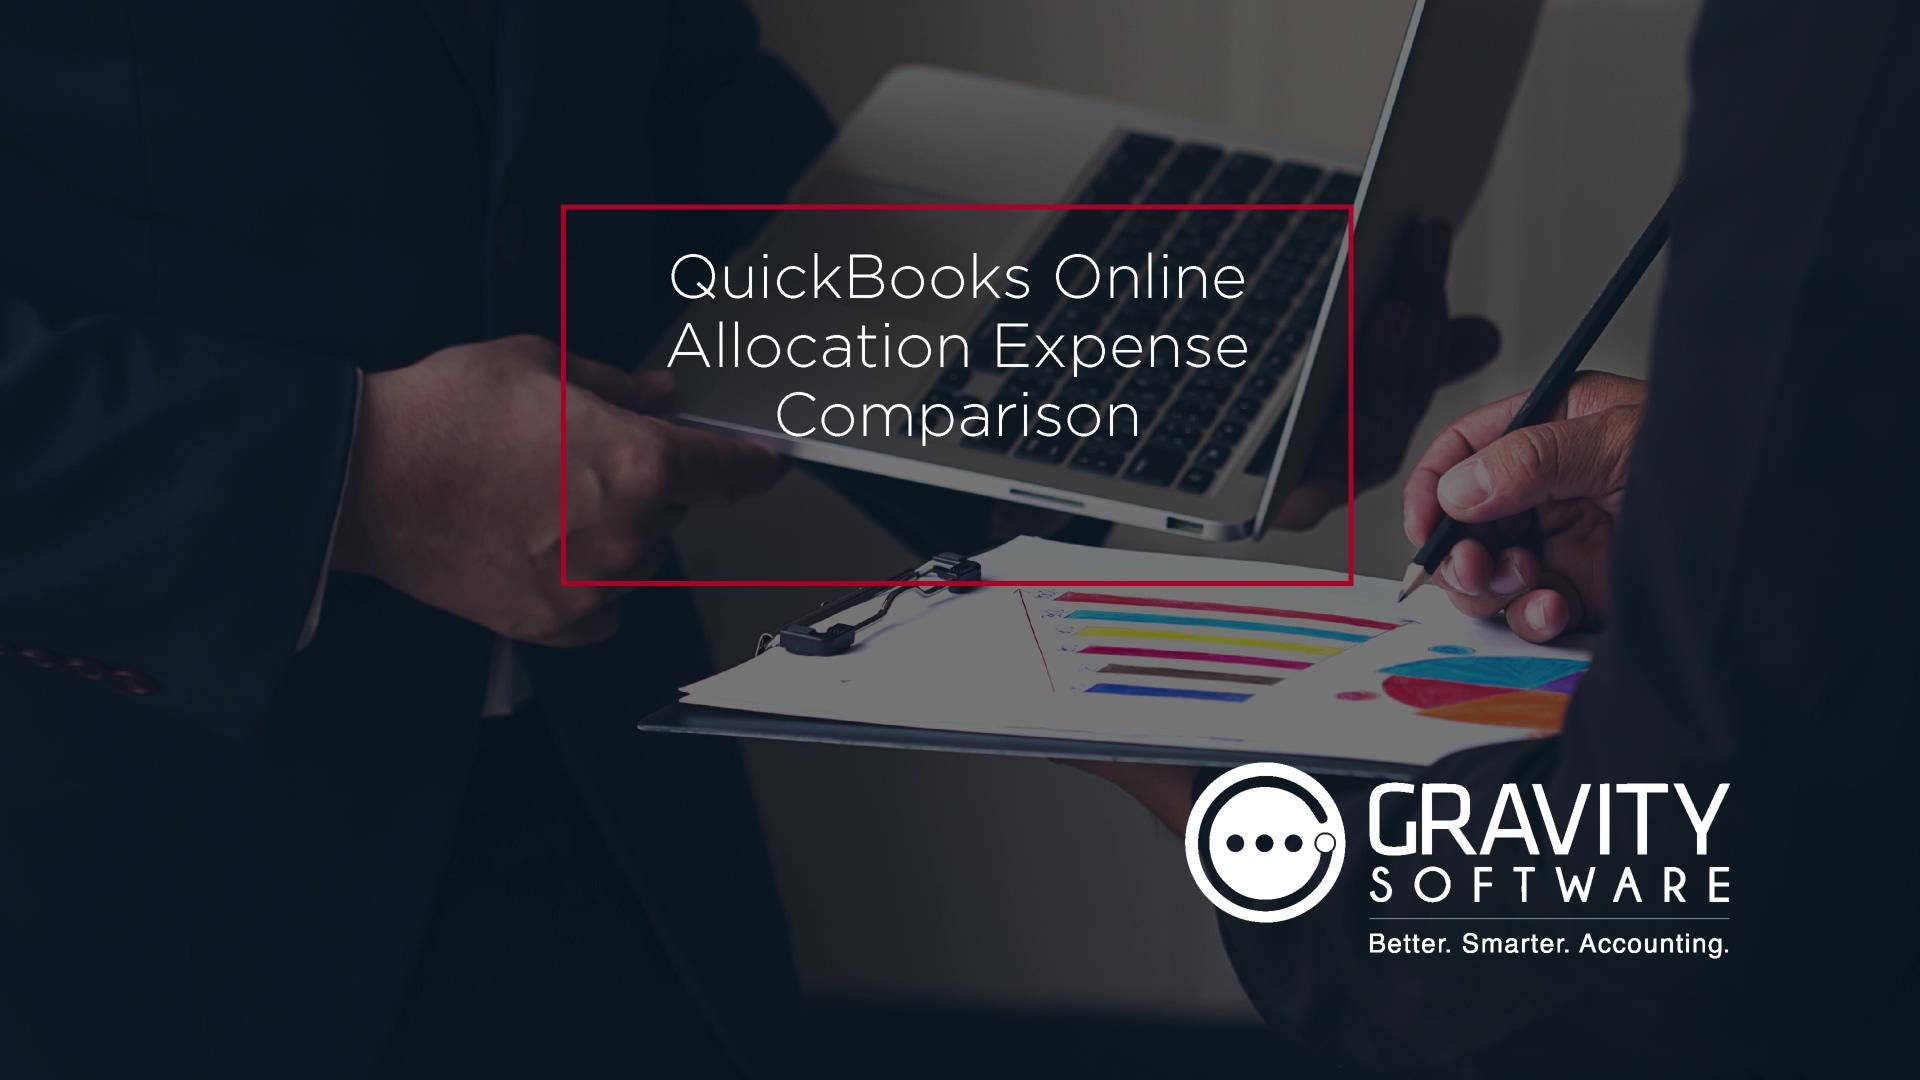 QuickBooks Online Allocation Expense Comparison